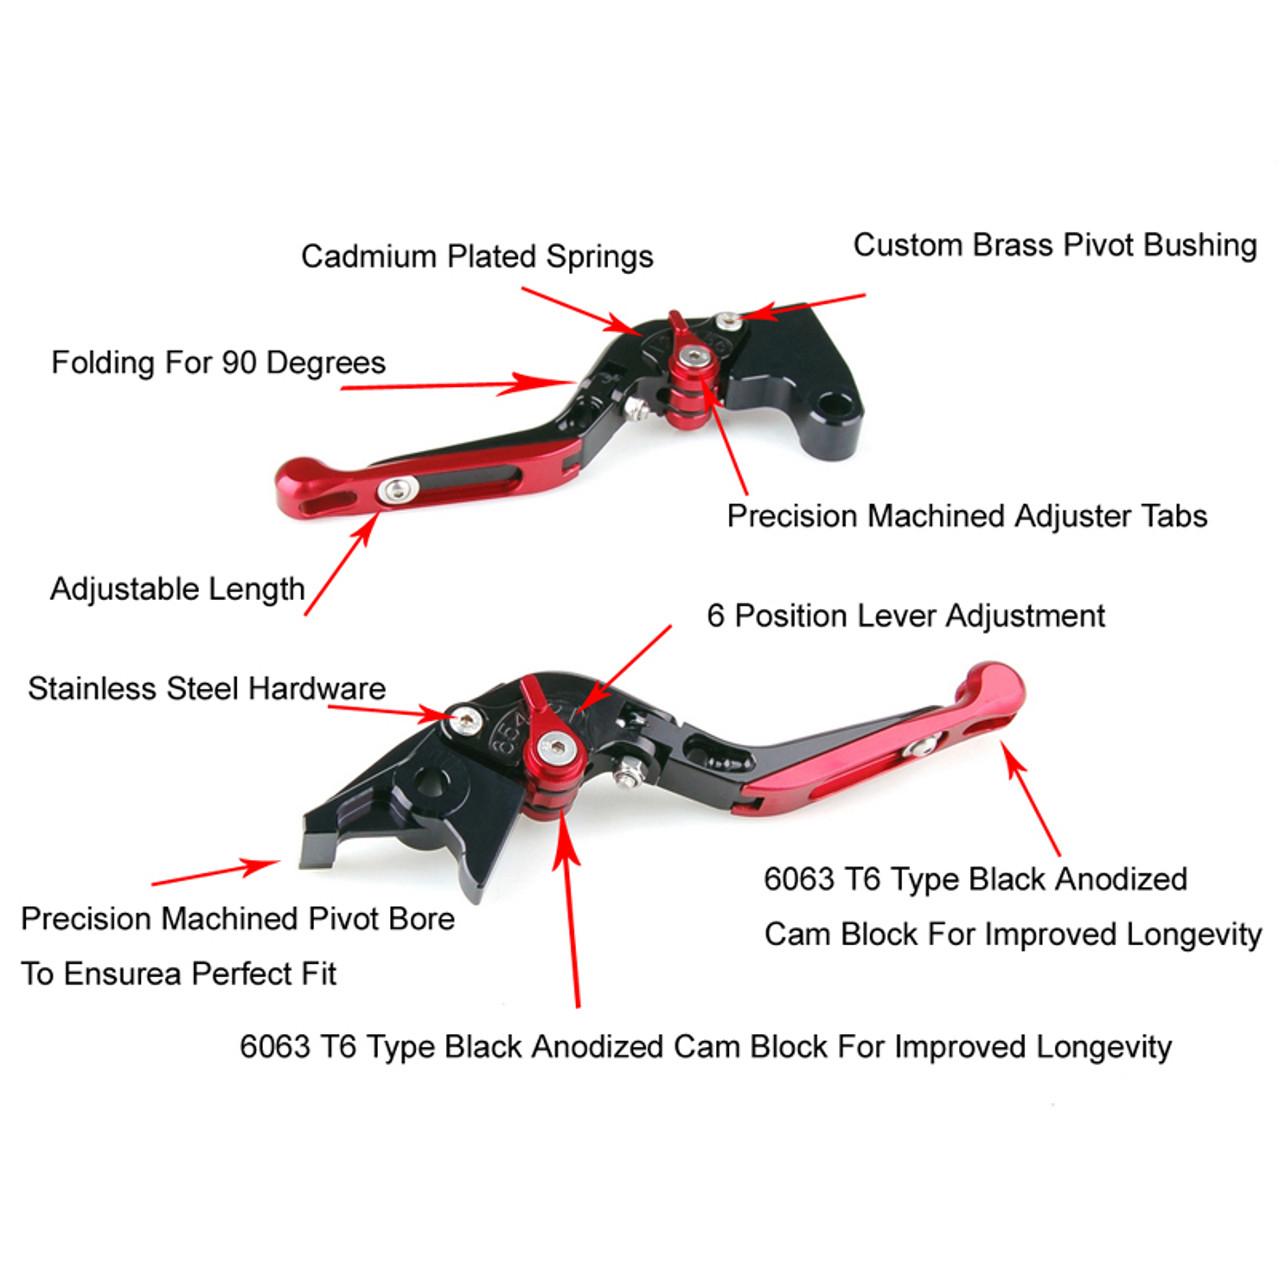 Staff Length Adjustable Brake Clutch Levers Ducati SPORT 1000 2006-2009 (DB-80/DC-80)